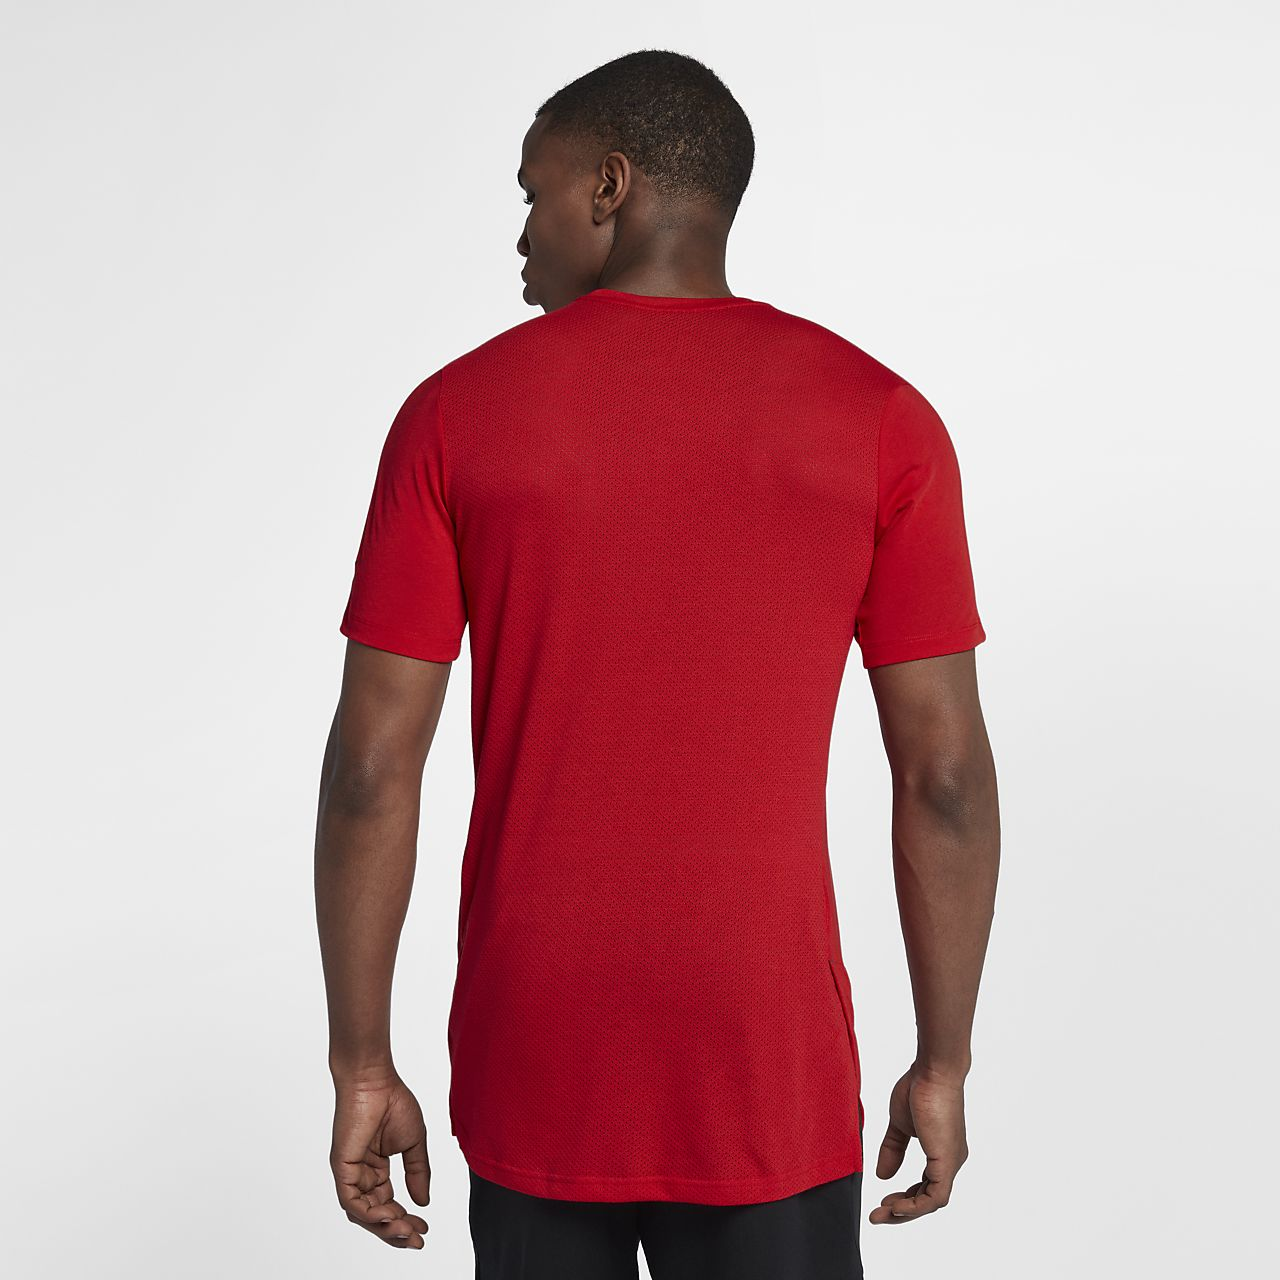 c1e1dac1 Nike Breathe Elite Men's Short-Sleeve Basketball Top. Nike.com ZA